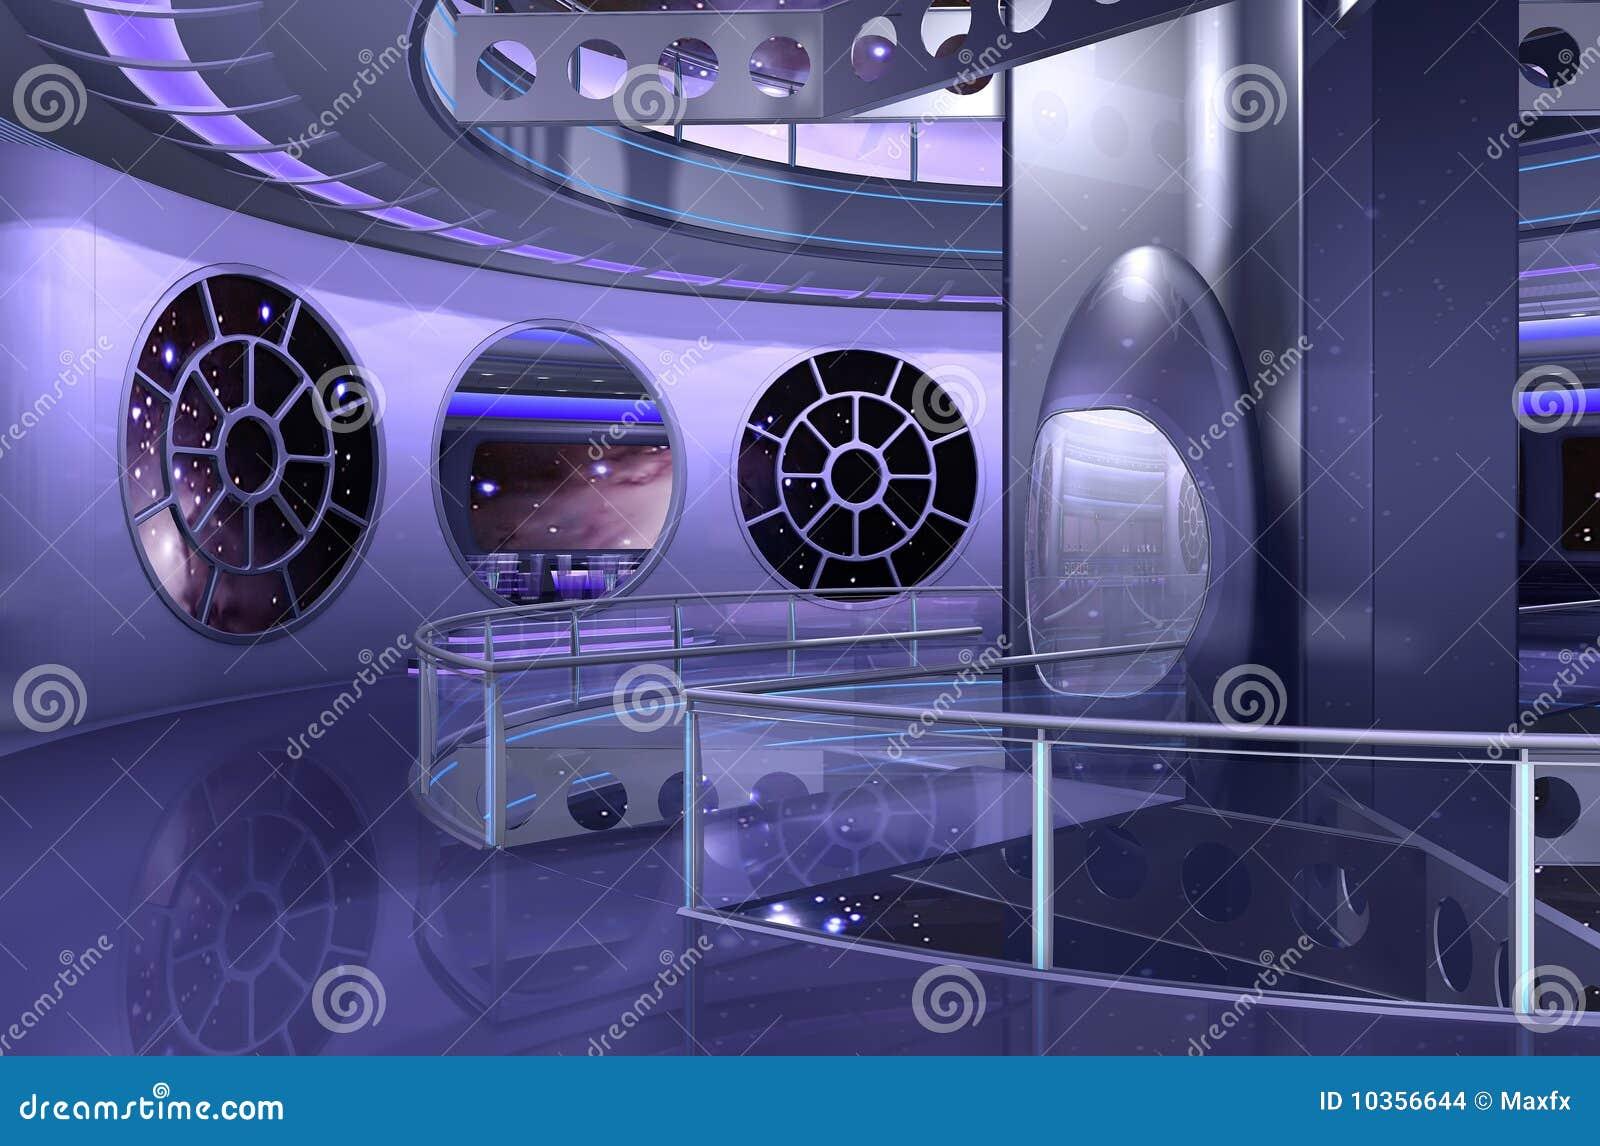 nave espacial 3d o ufo imagenes de archivo imagen 10356644. Black Bedroom Furniture Sets. Home Design Ideas